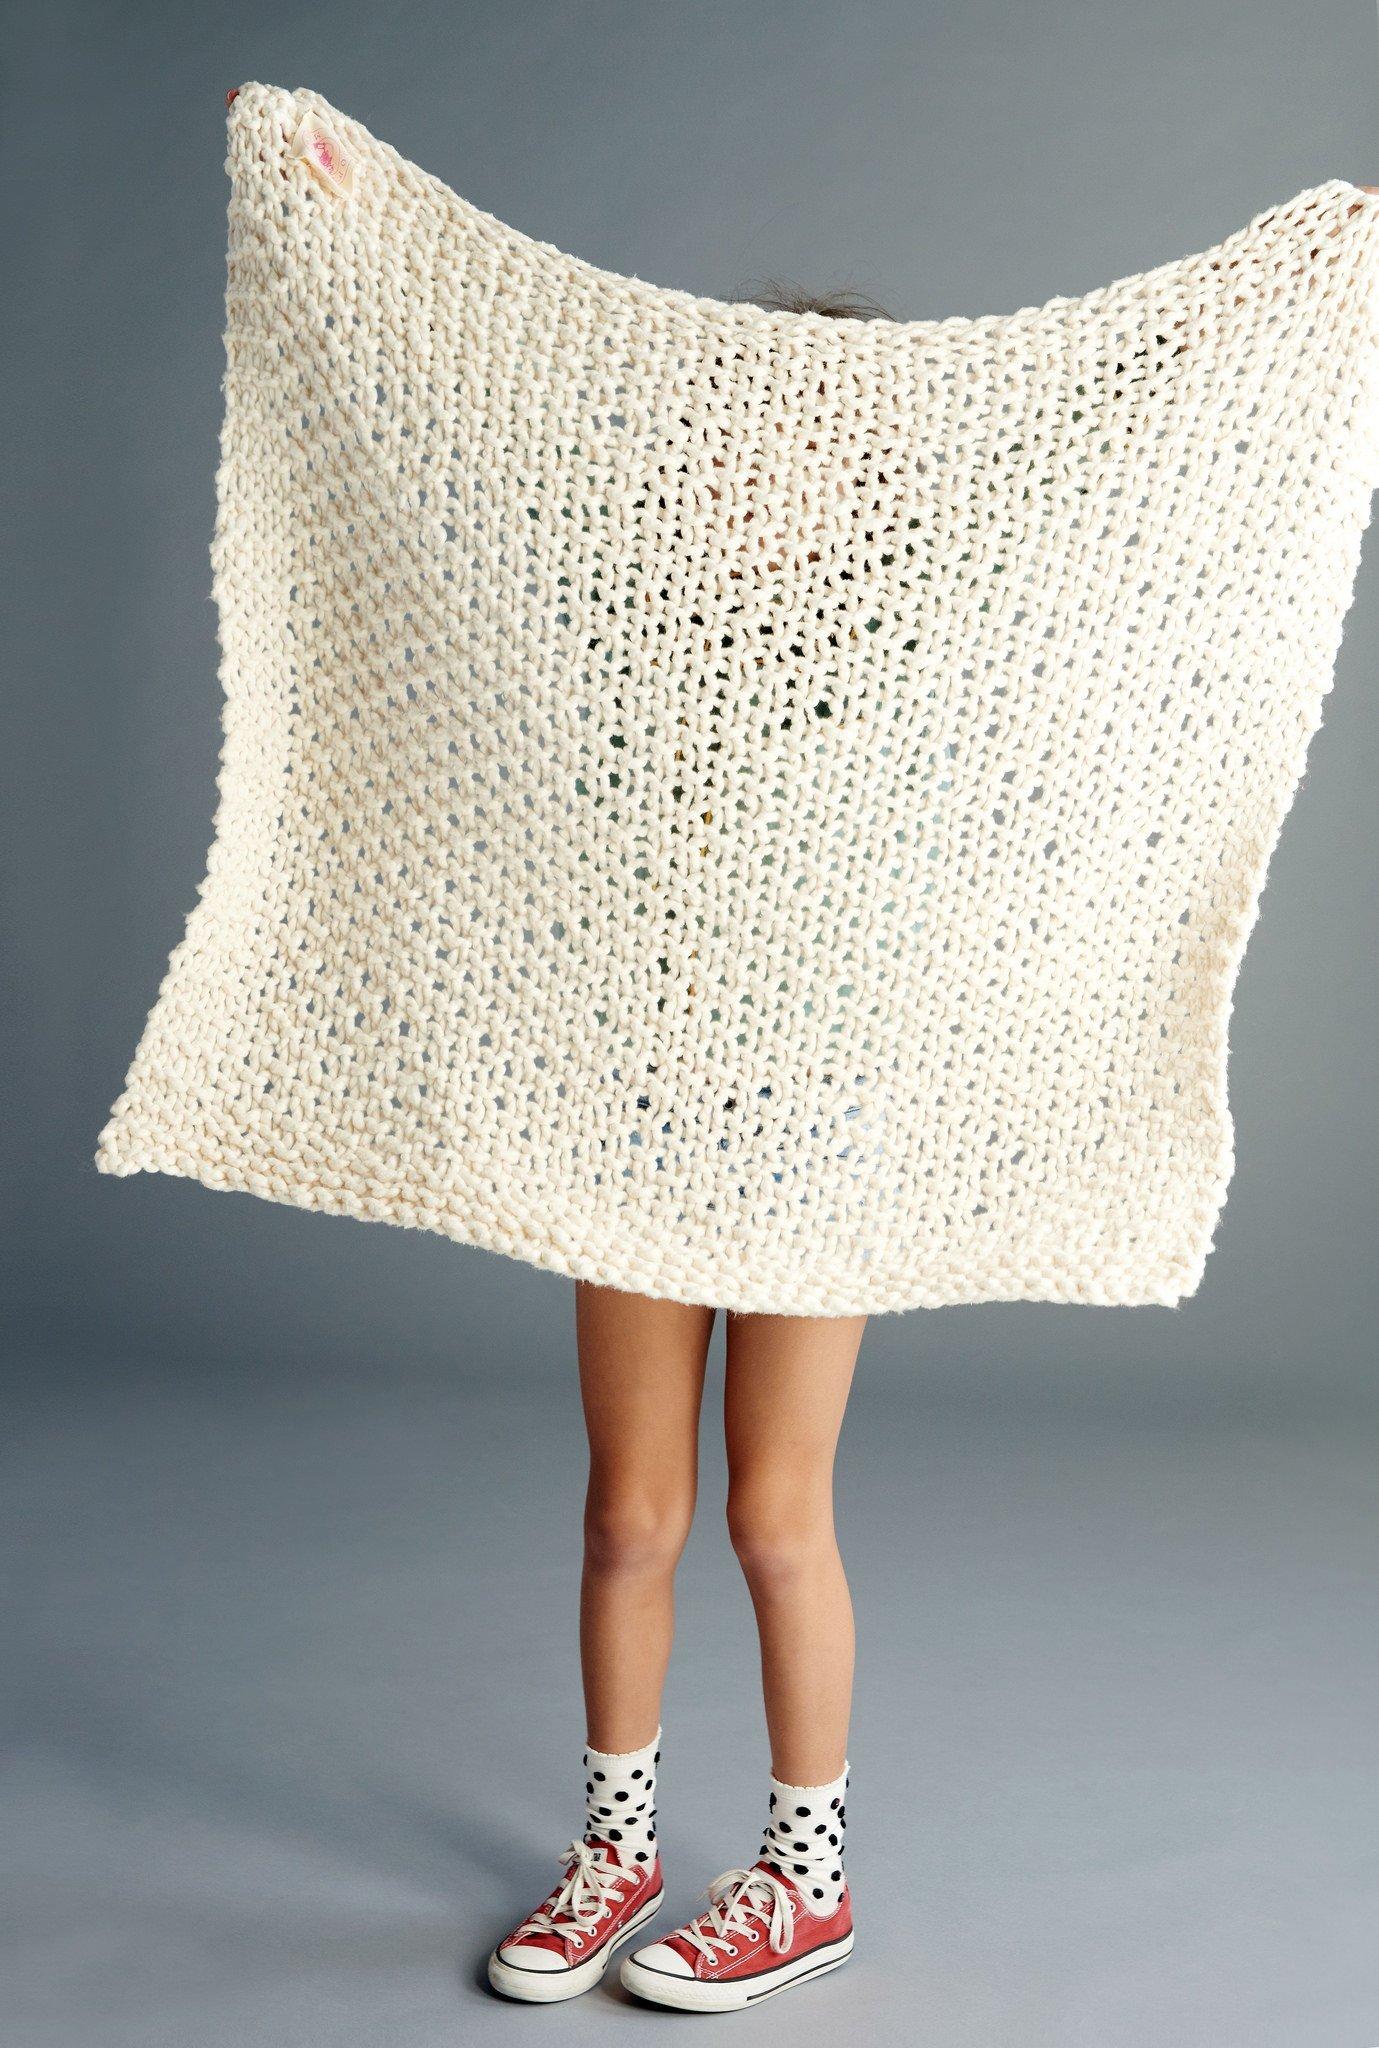 Loopy Mango DIY Kit - Cotton Baby Blanket-Tahitian Pearl by Loopy Mango (Image #3)